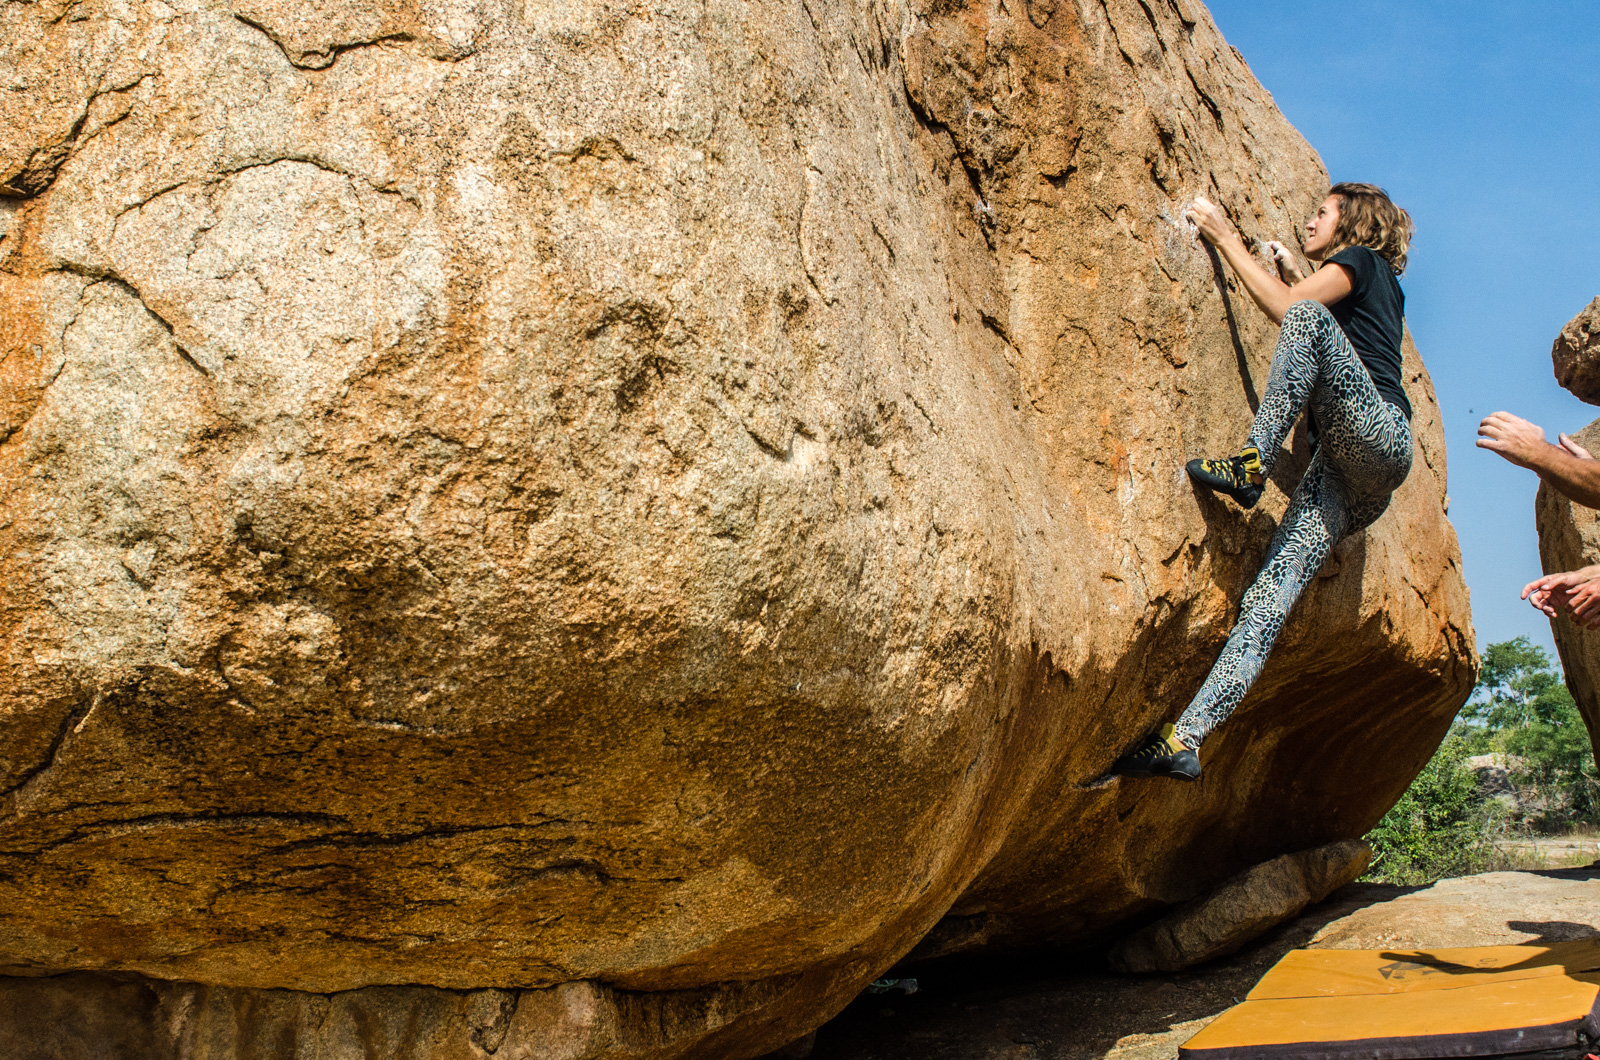 Hampi-India-bouldering-rockclimbing-AmyRolloPhoto-0815.jpg